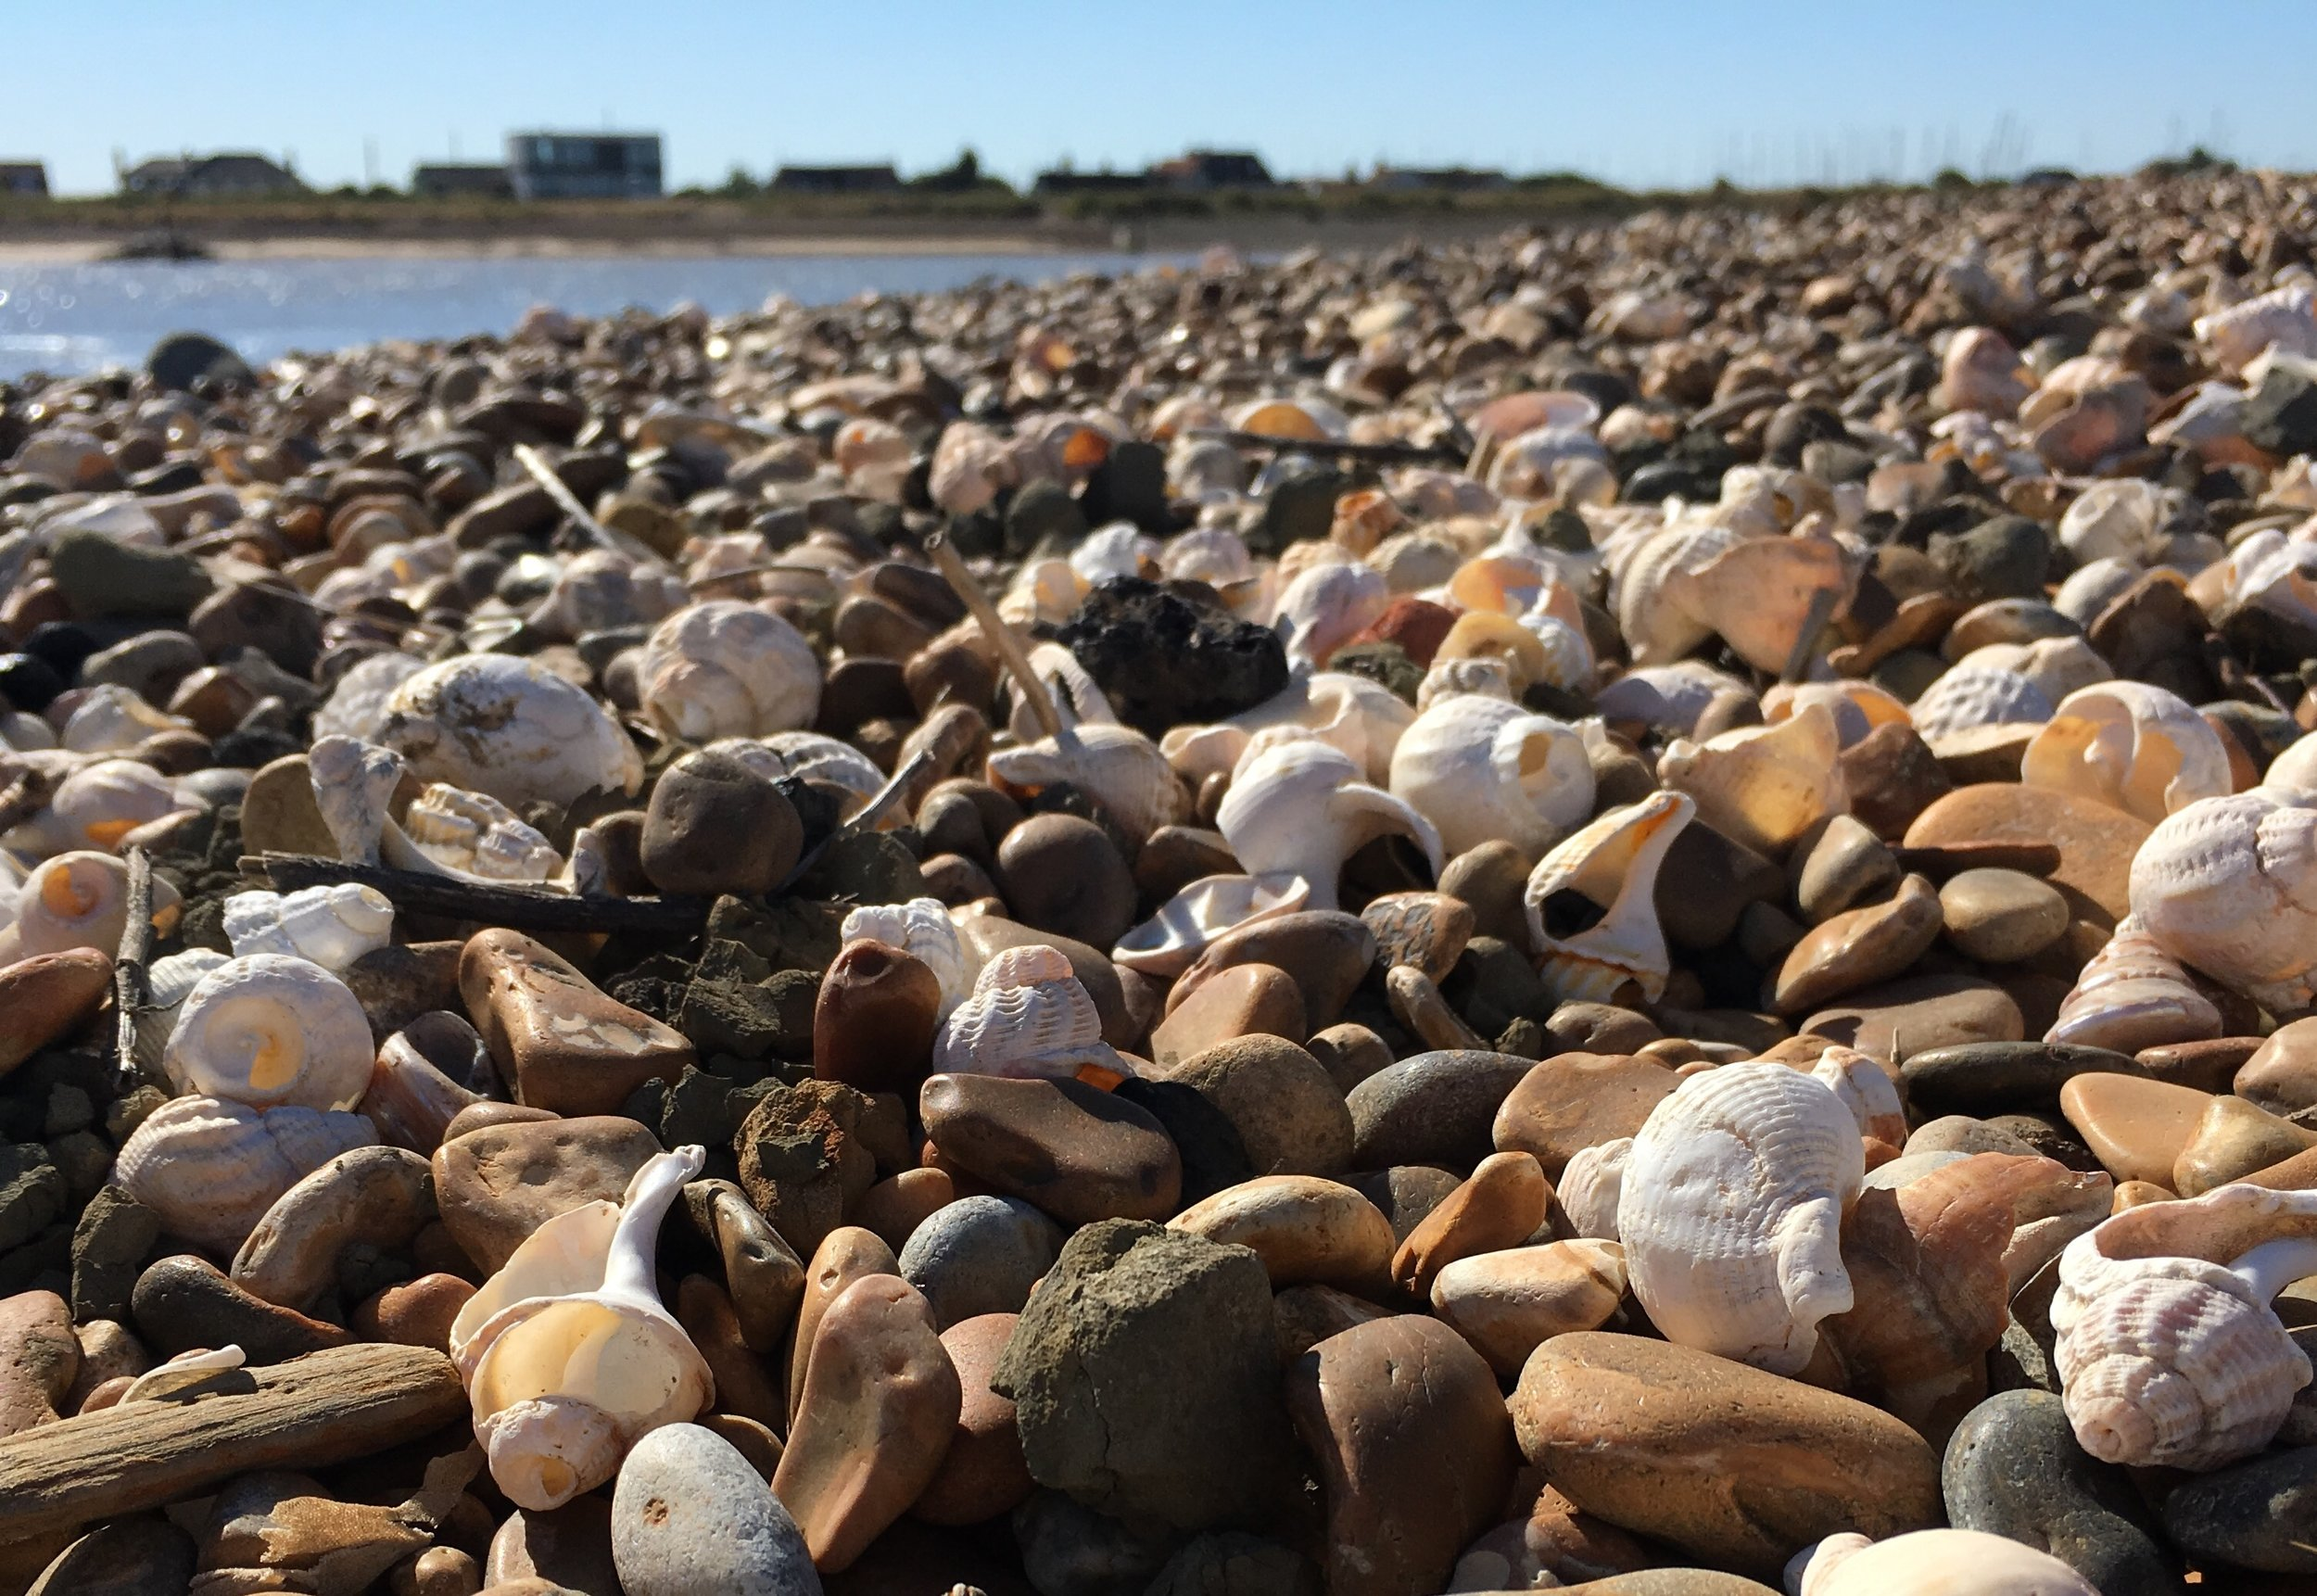 Bawdsey beach with whelk shells.jpg